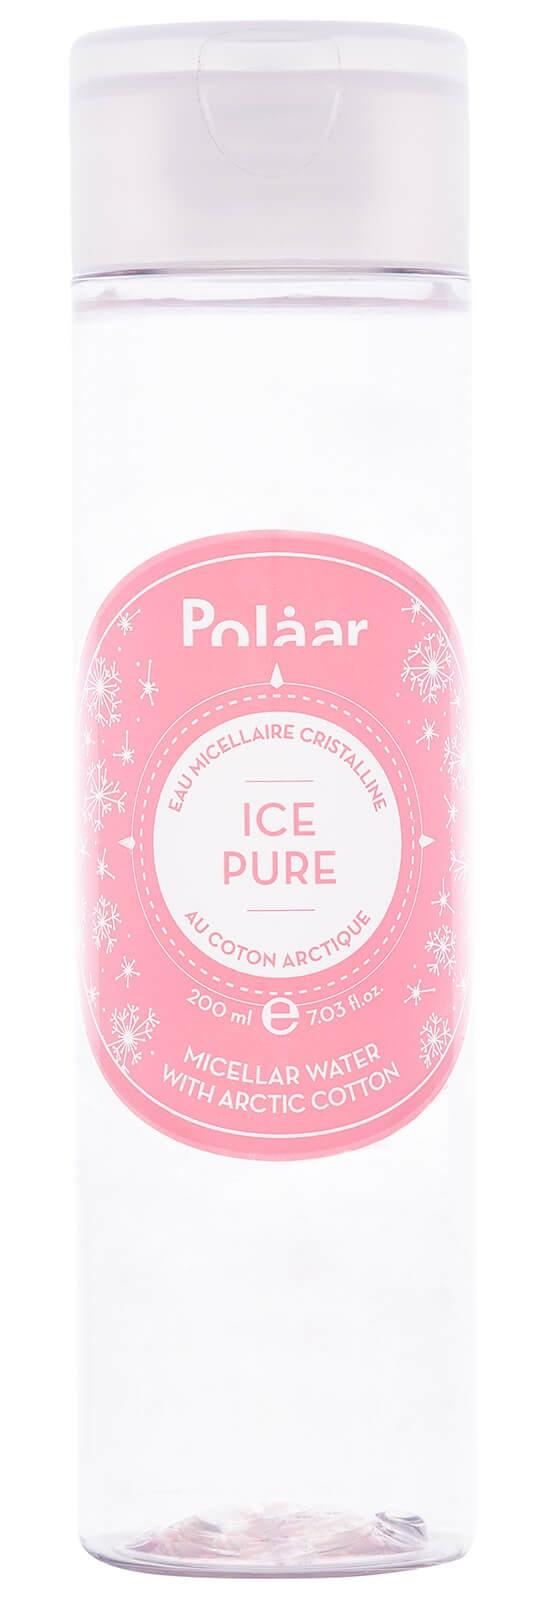 Polaar Arctic Cotton Micellar Water